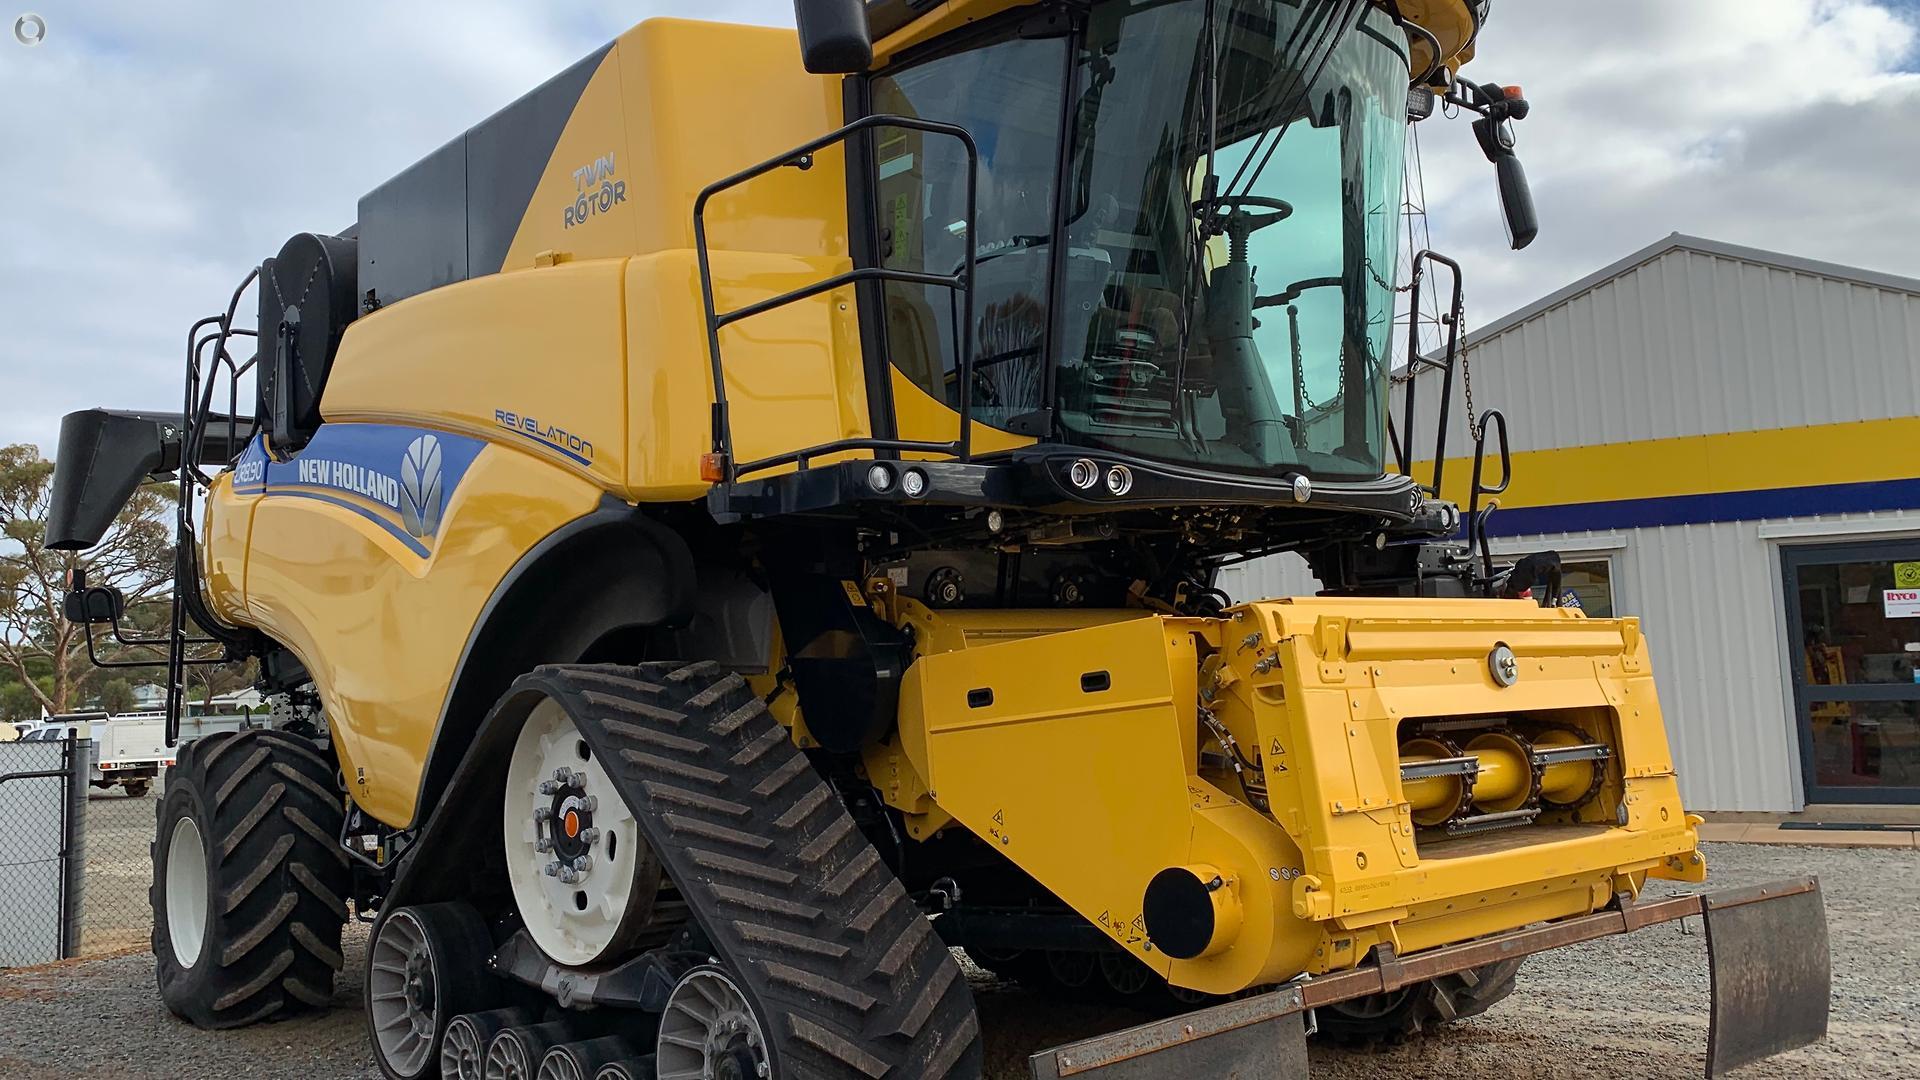 2018 New Holland CR8.90 Combine Harvester